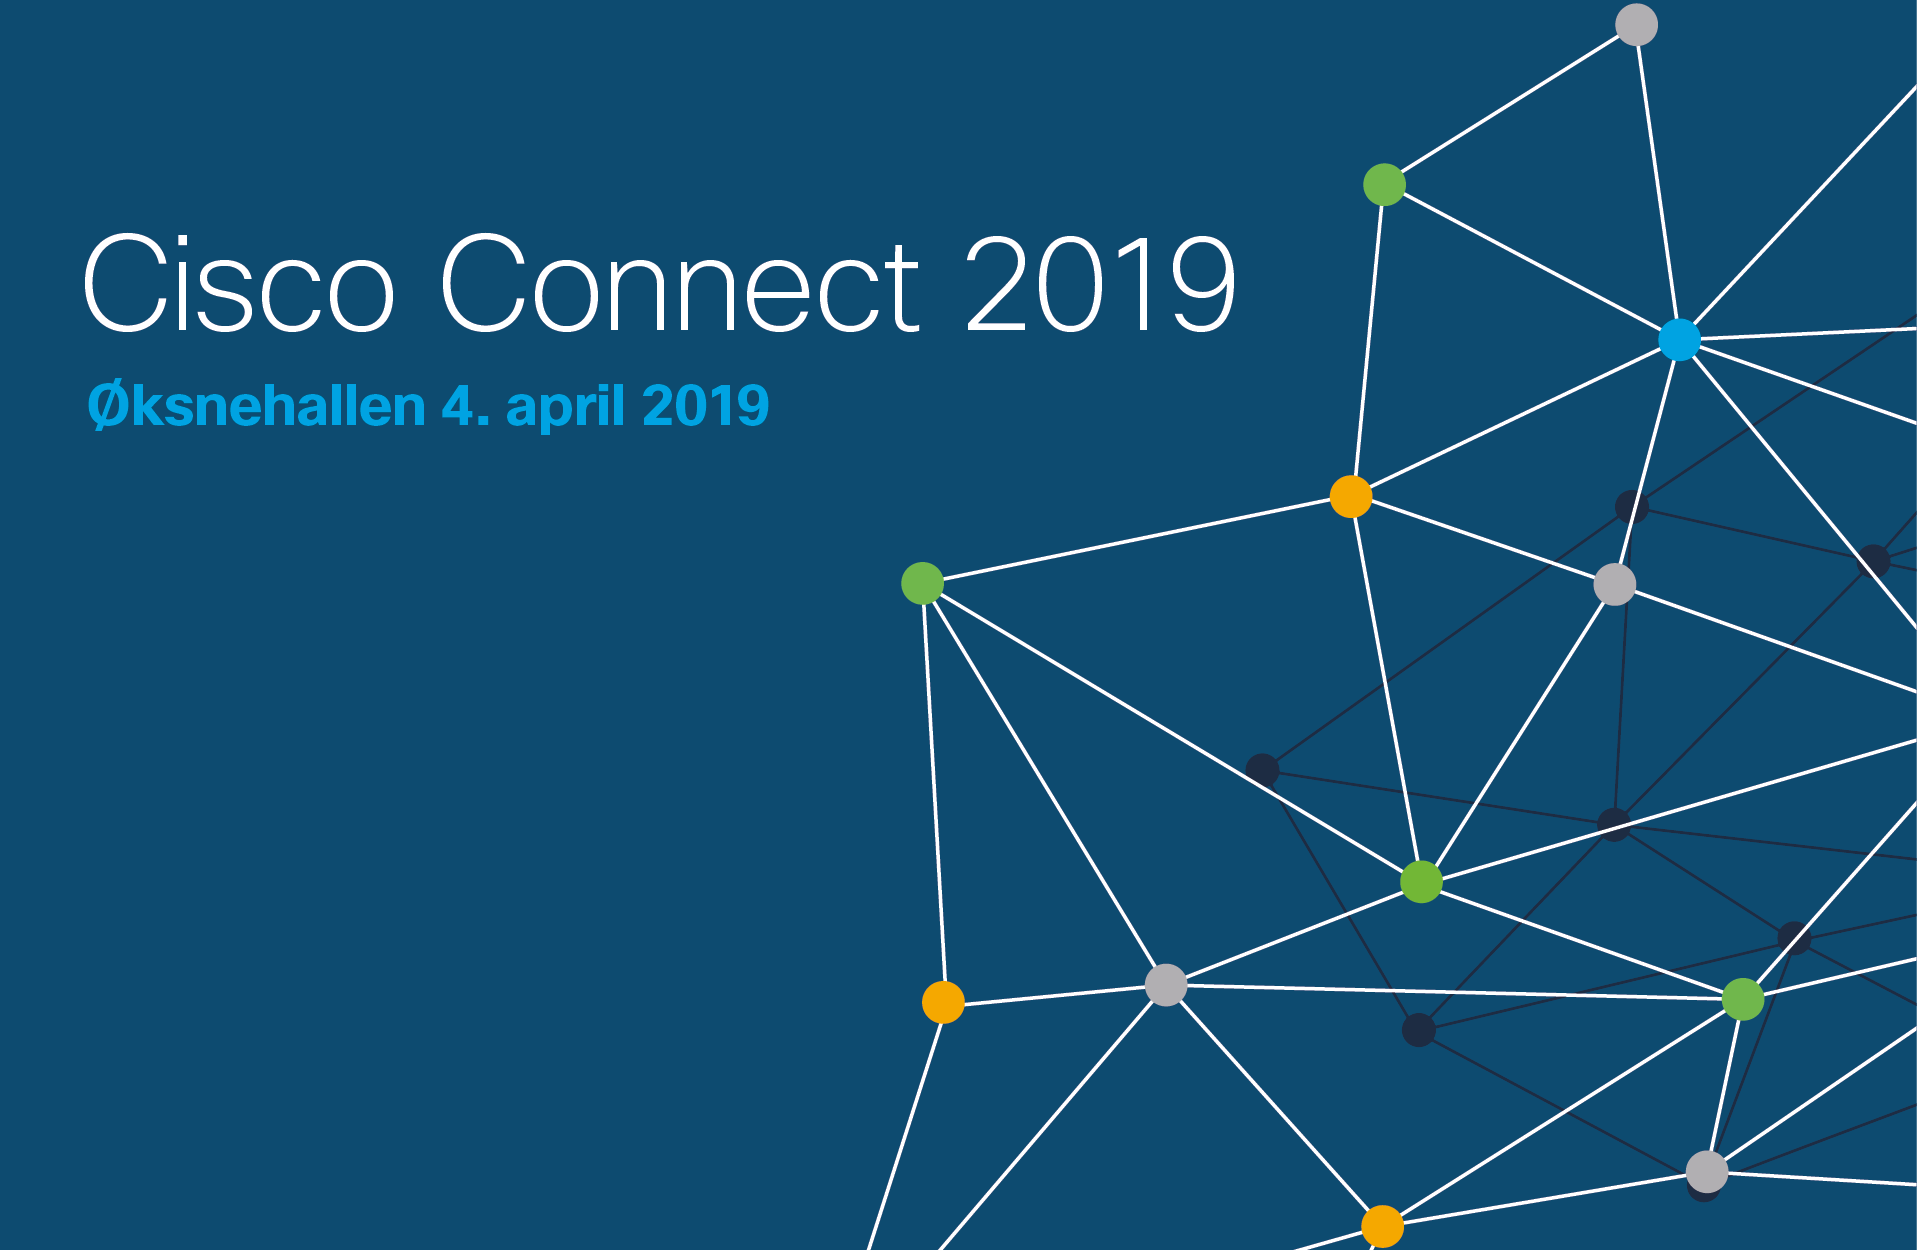 cisco connect 2019